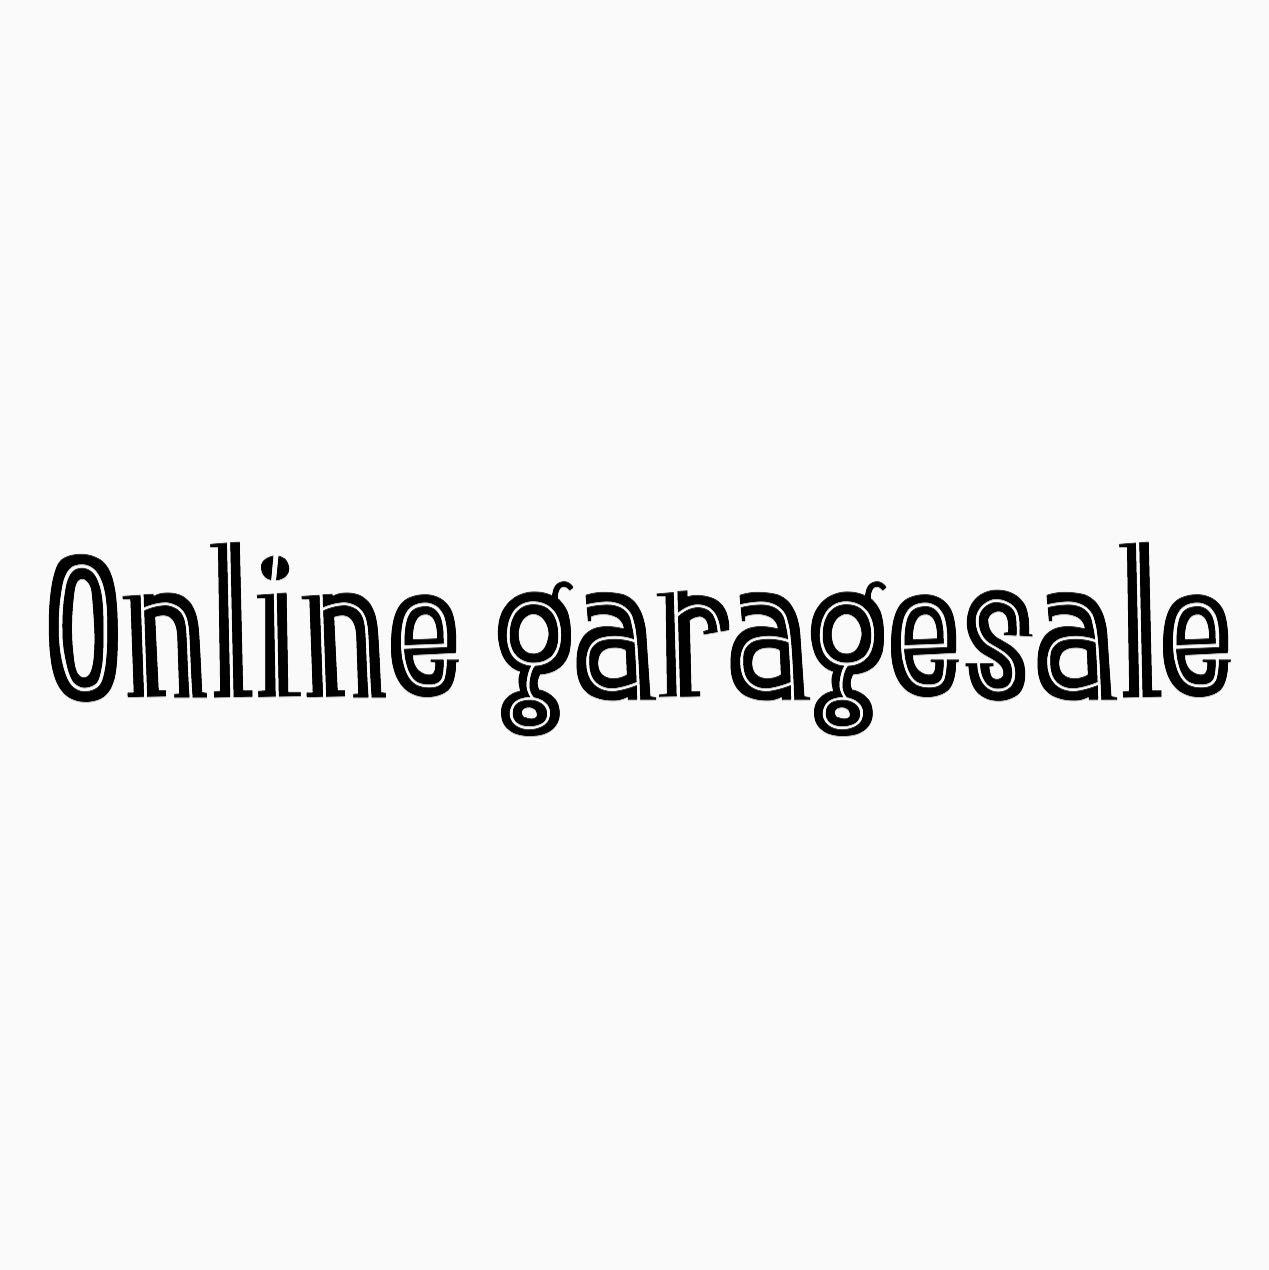 onlinegaragesale